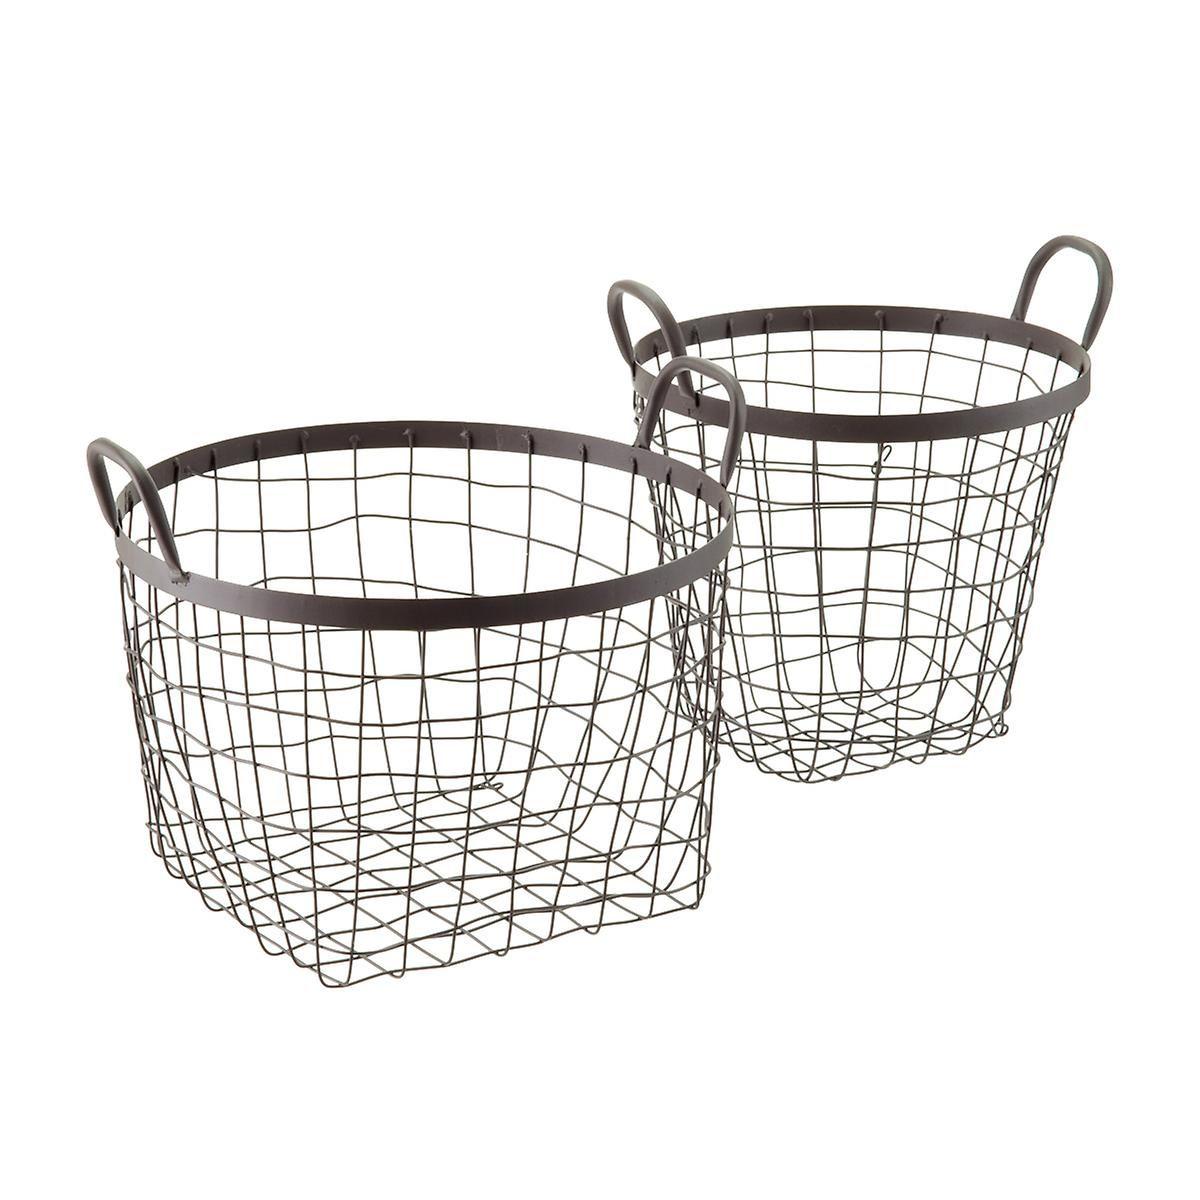 Rustic Decorative Storage Baskets with Handles | Rustic decorative ...